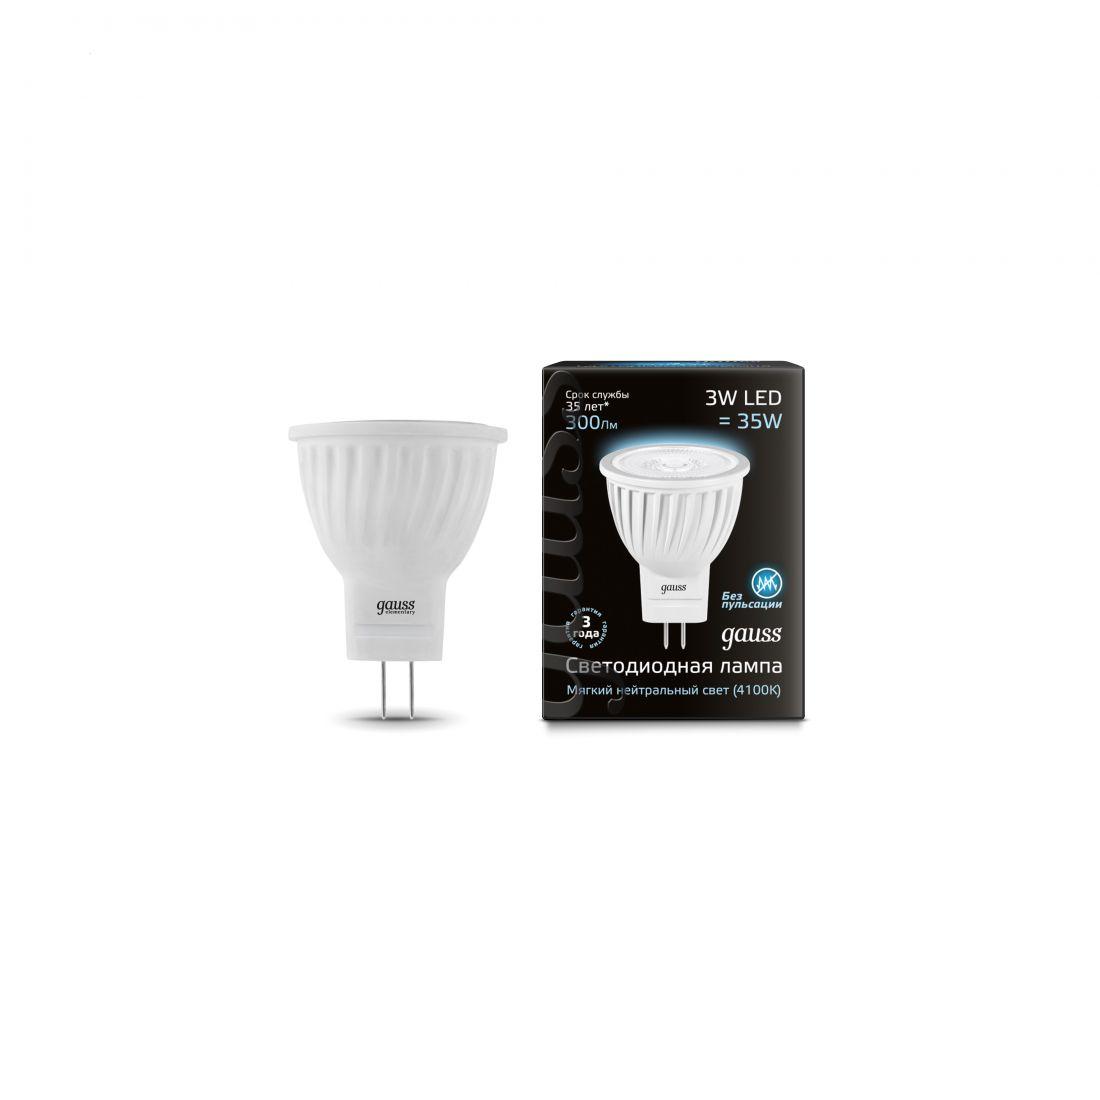 Лампа Gauss LED 3W MR11 GU4 220-240V 4100K